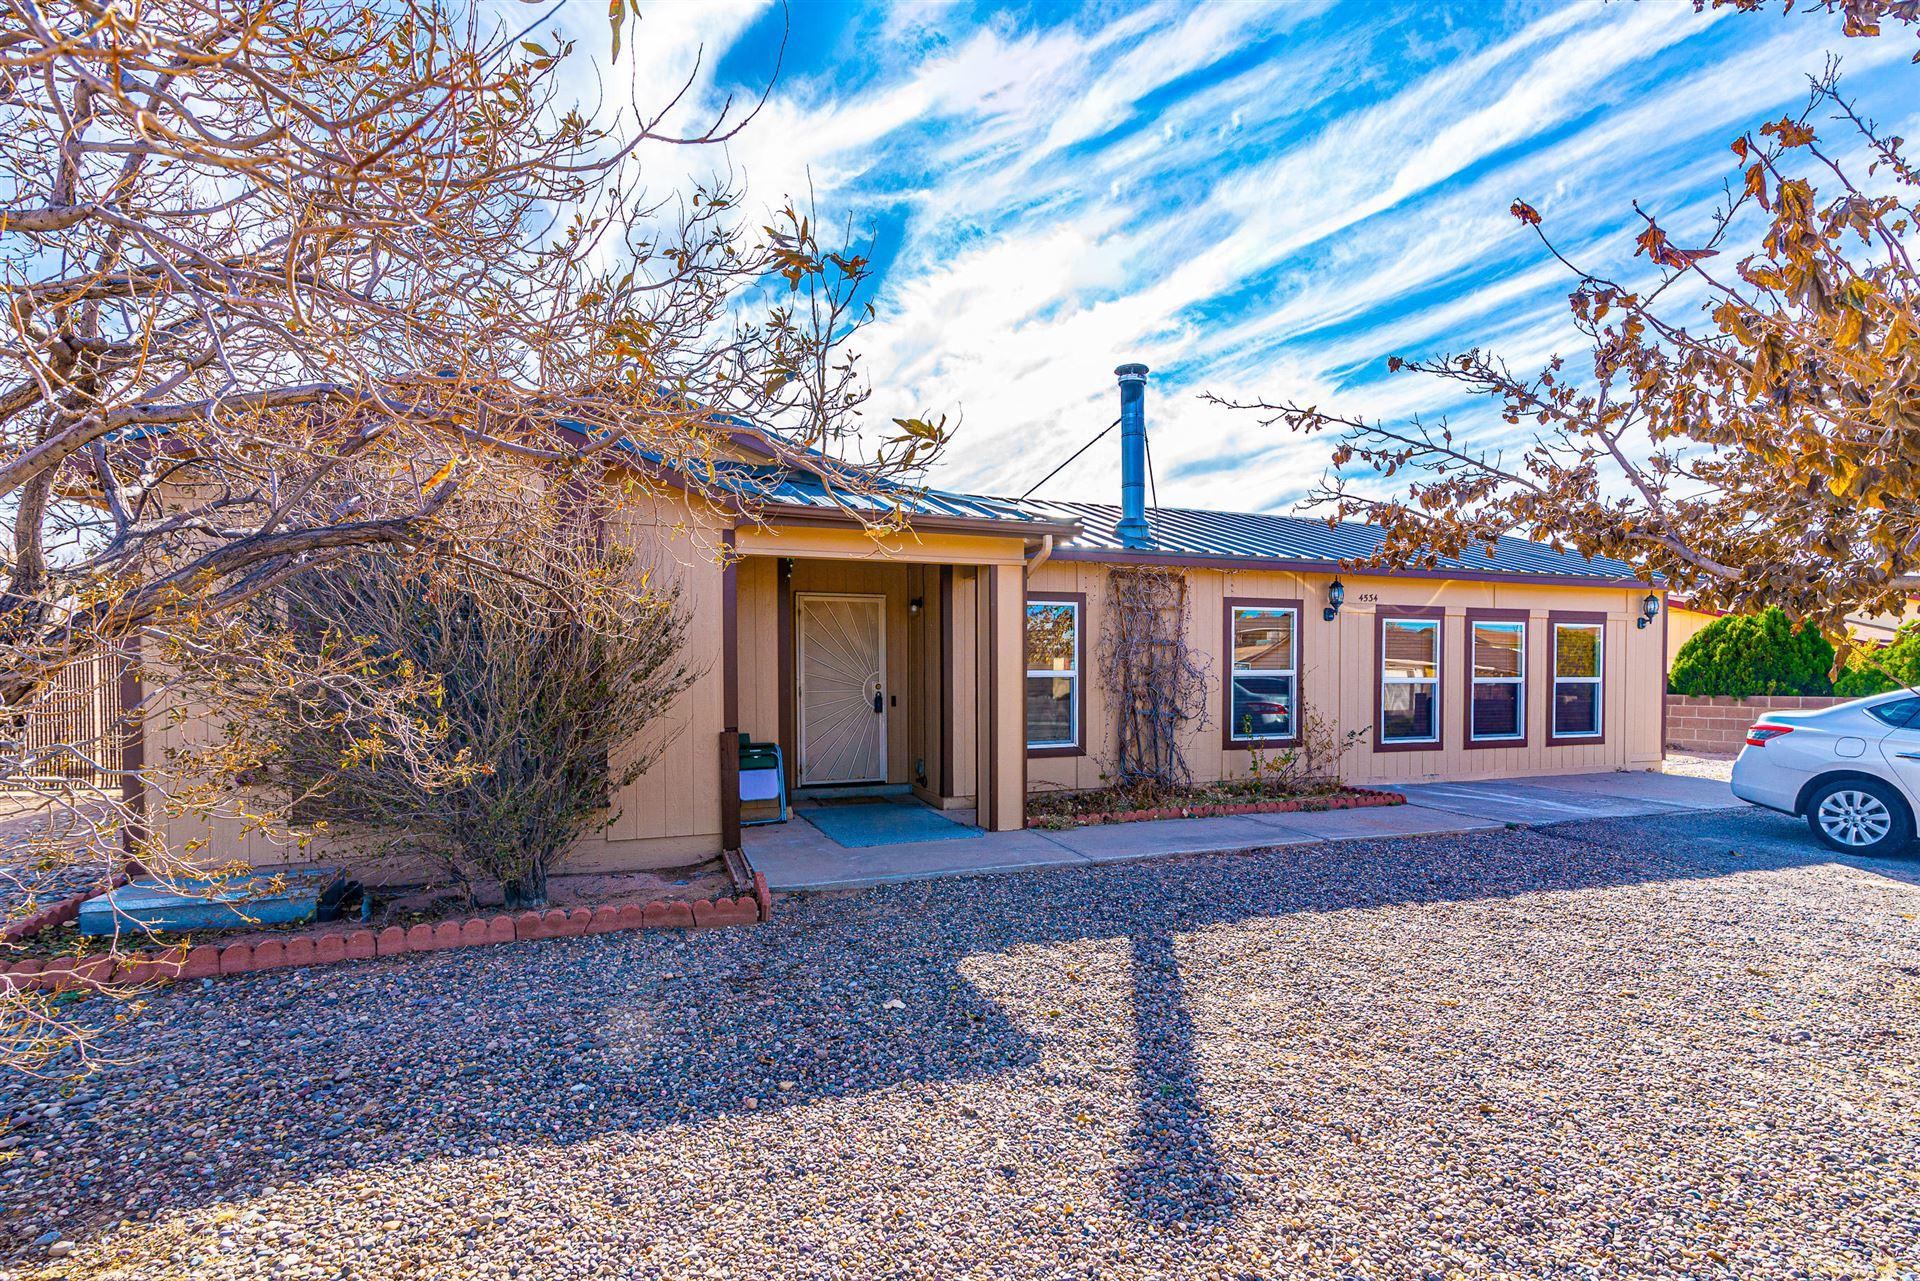 4534 SUNSTONE Way NE, Rio Rancho, NM 87124 - #: 981103